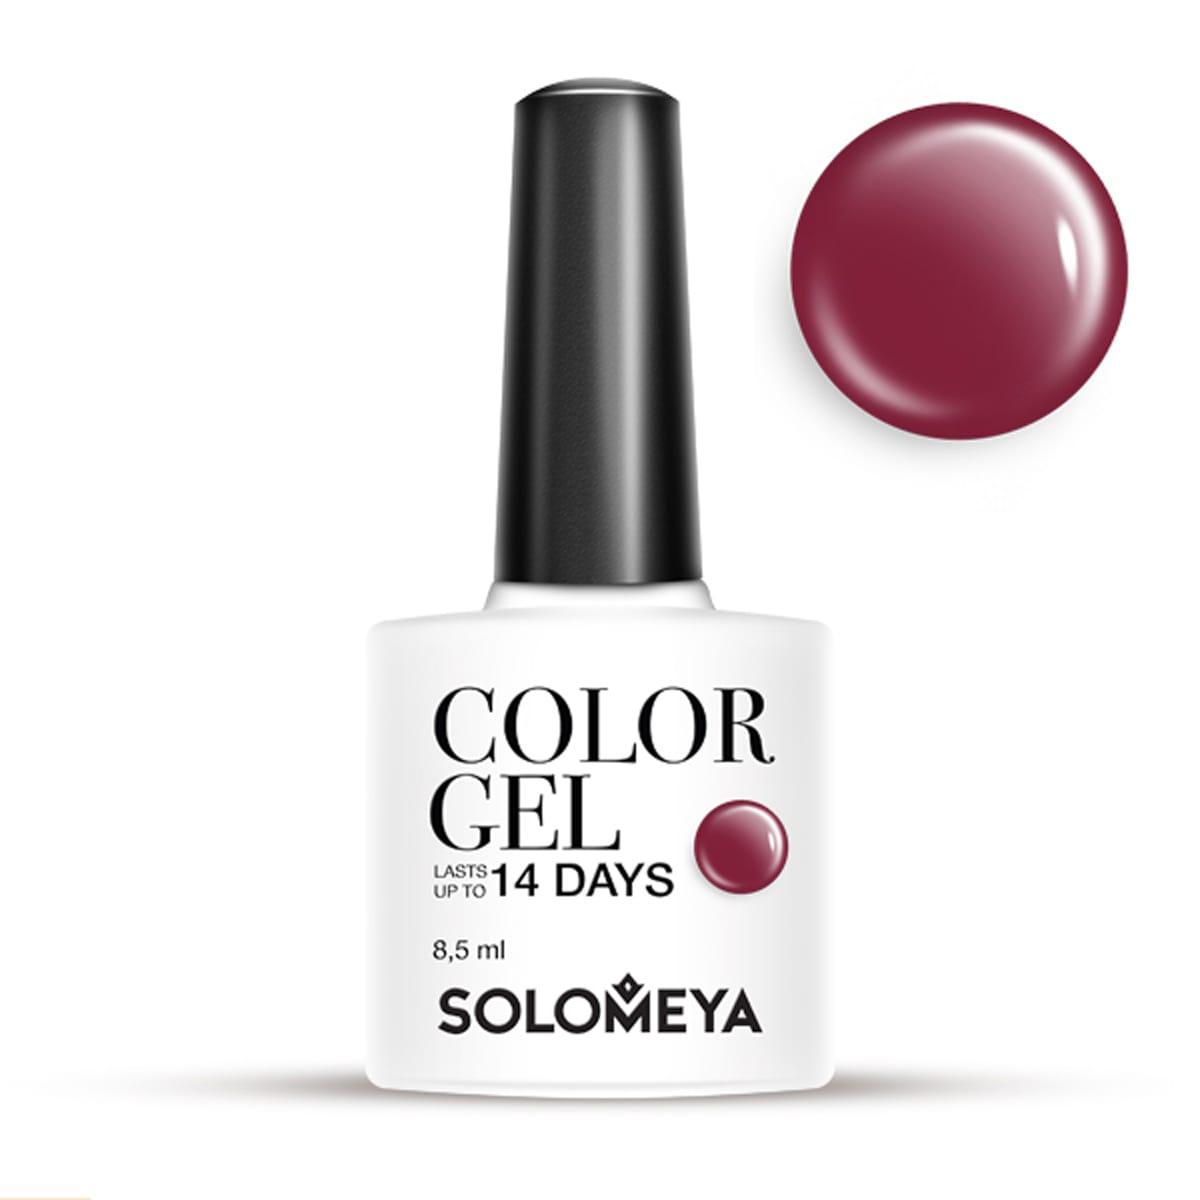 Solomeya гель-лак для ногтей scg141 бургундия